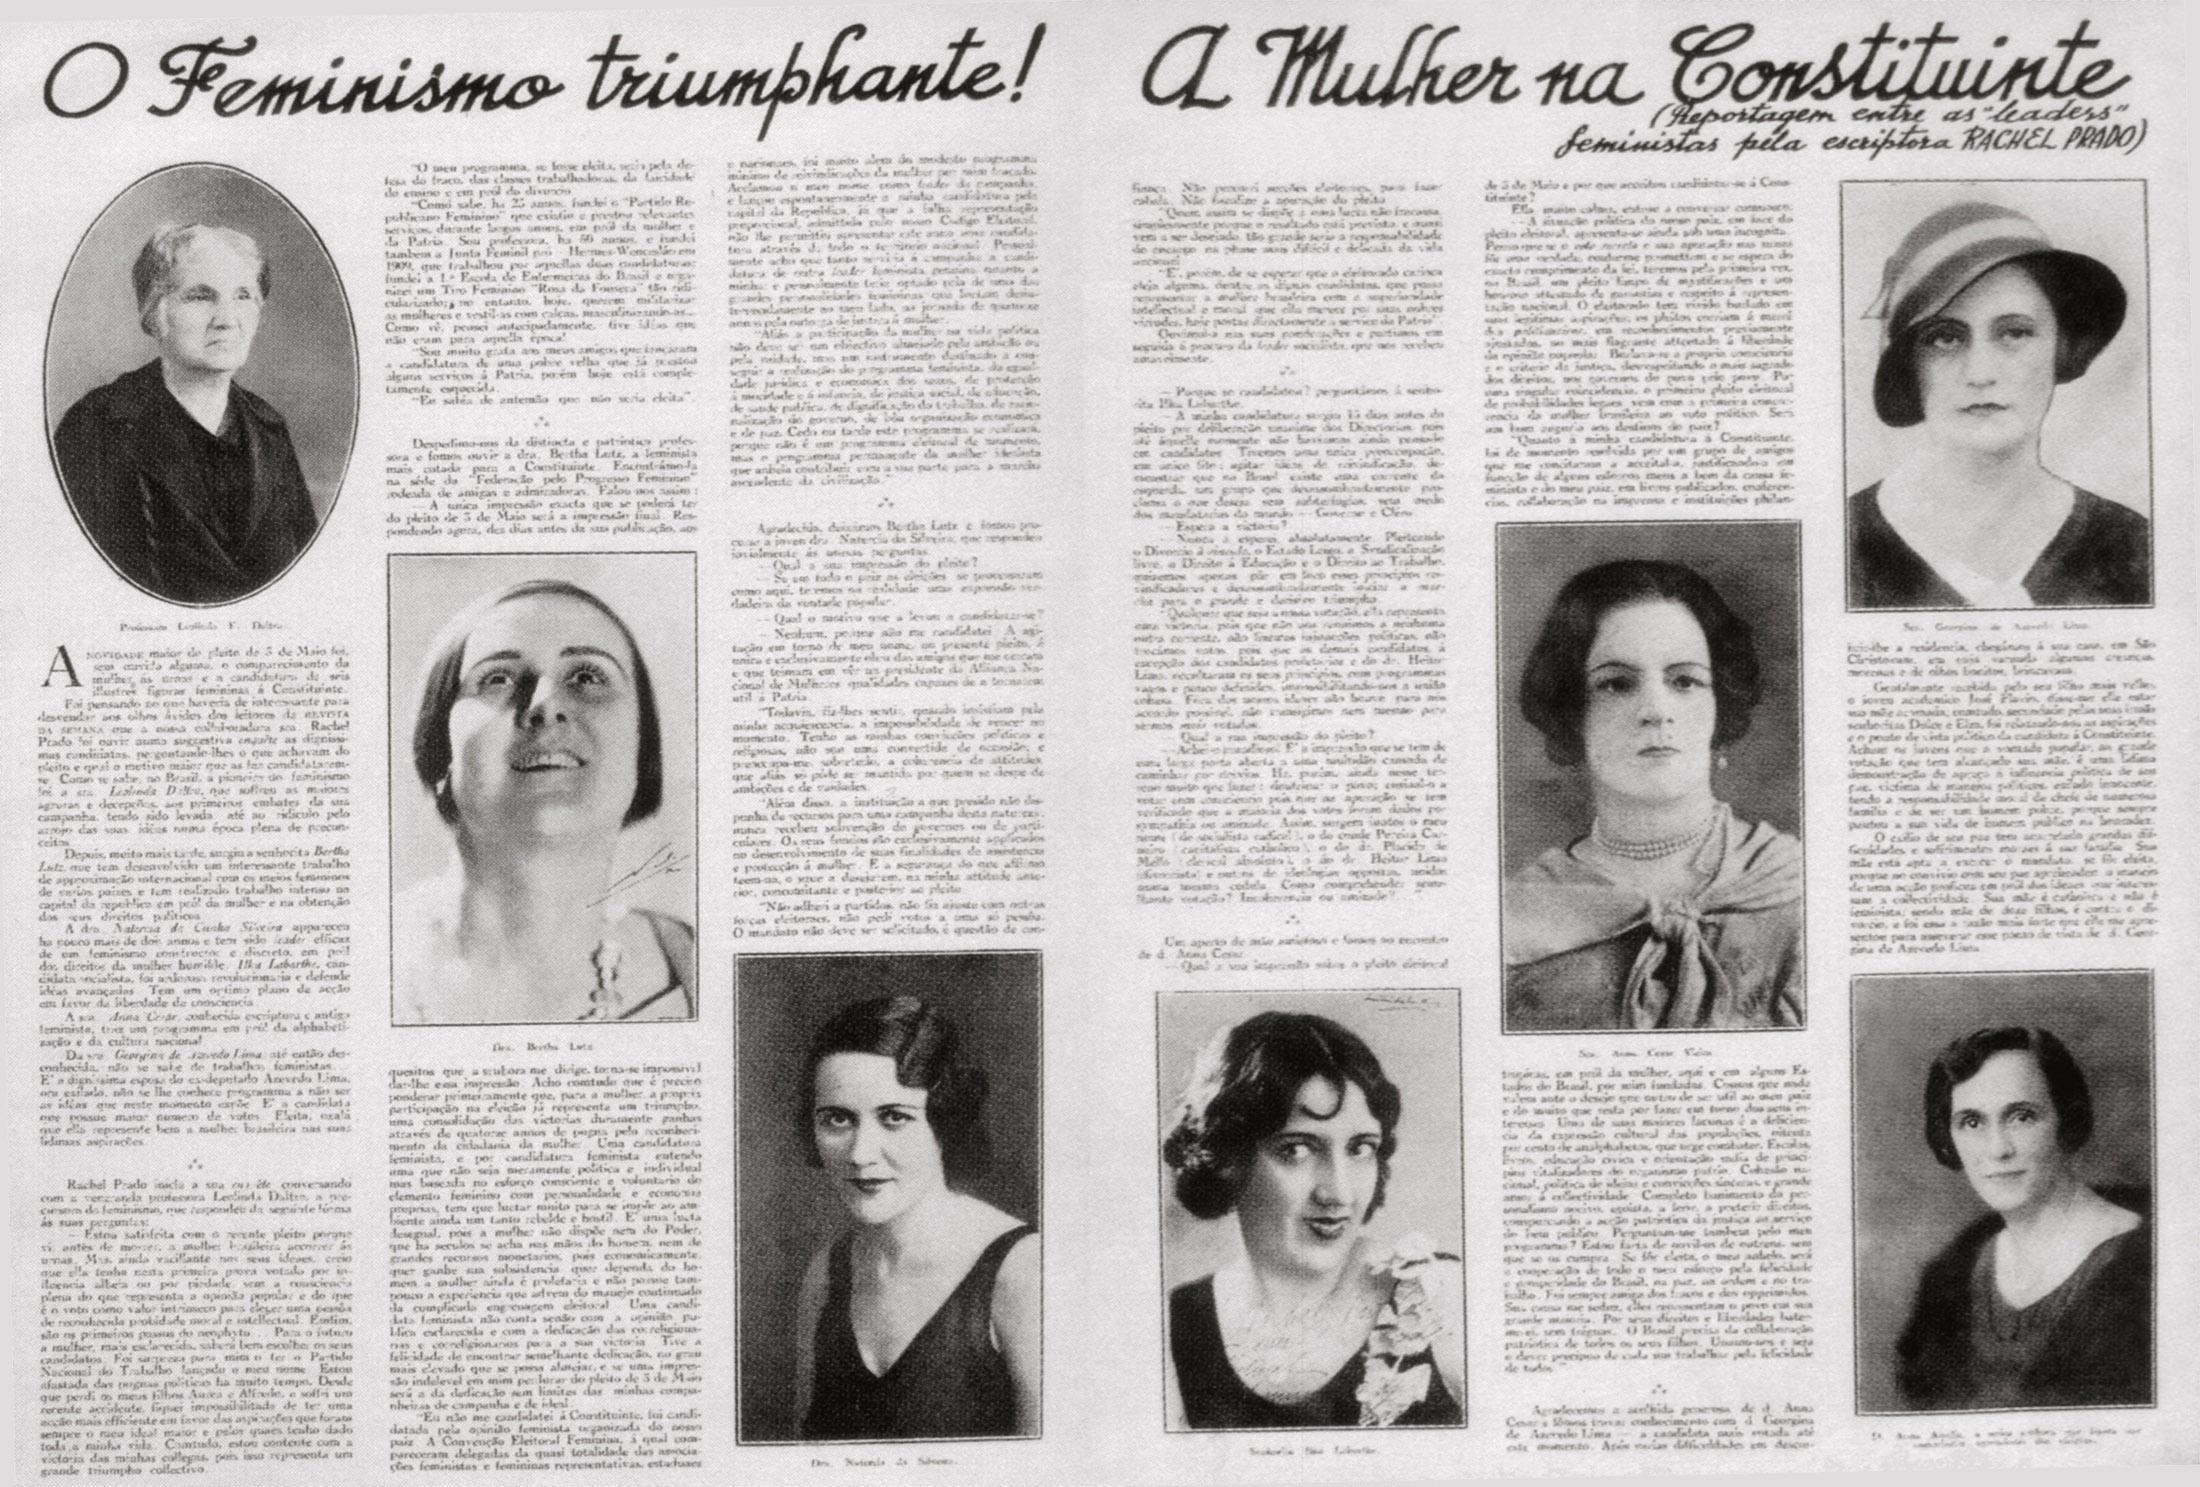 Brasil-feminino-a-mulher-na-constituinte-2